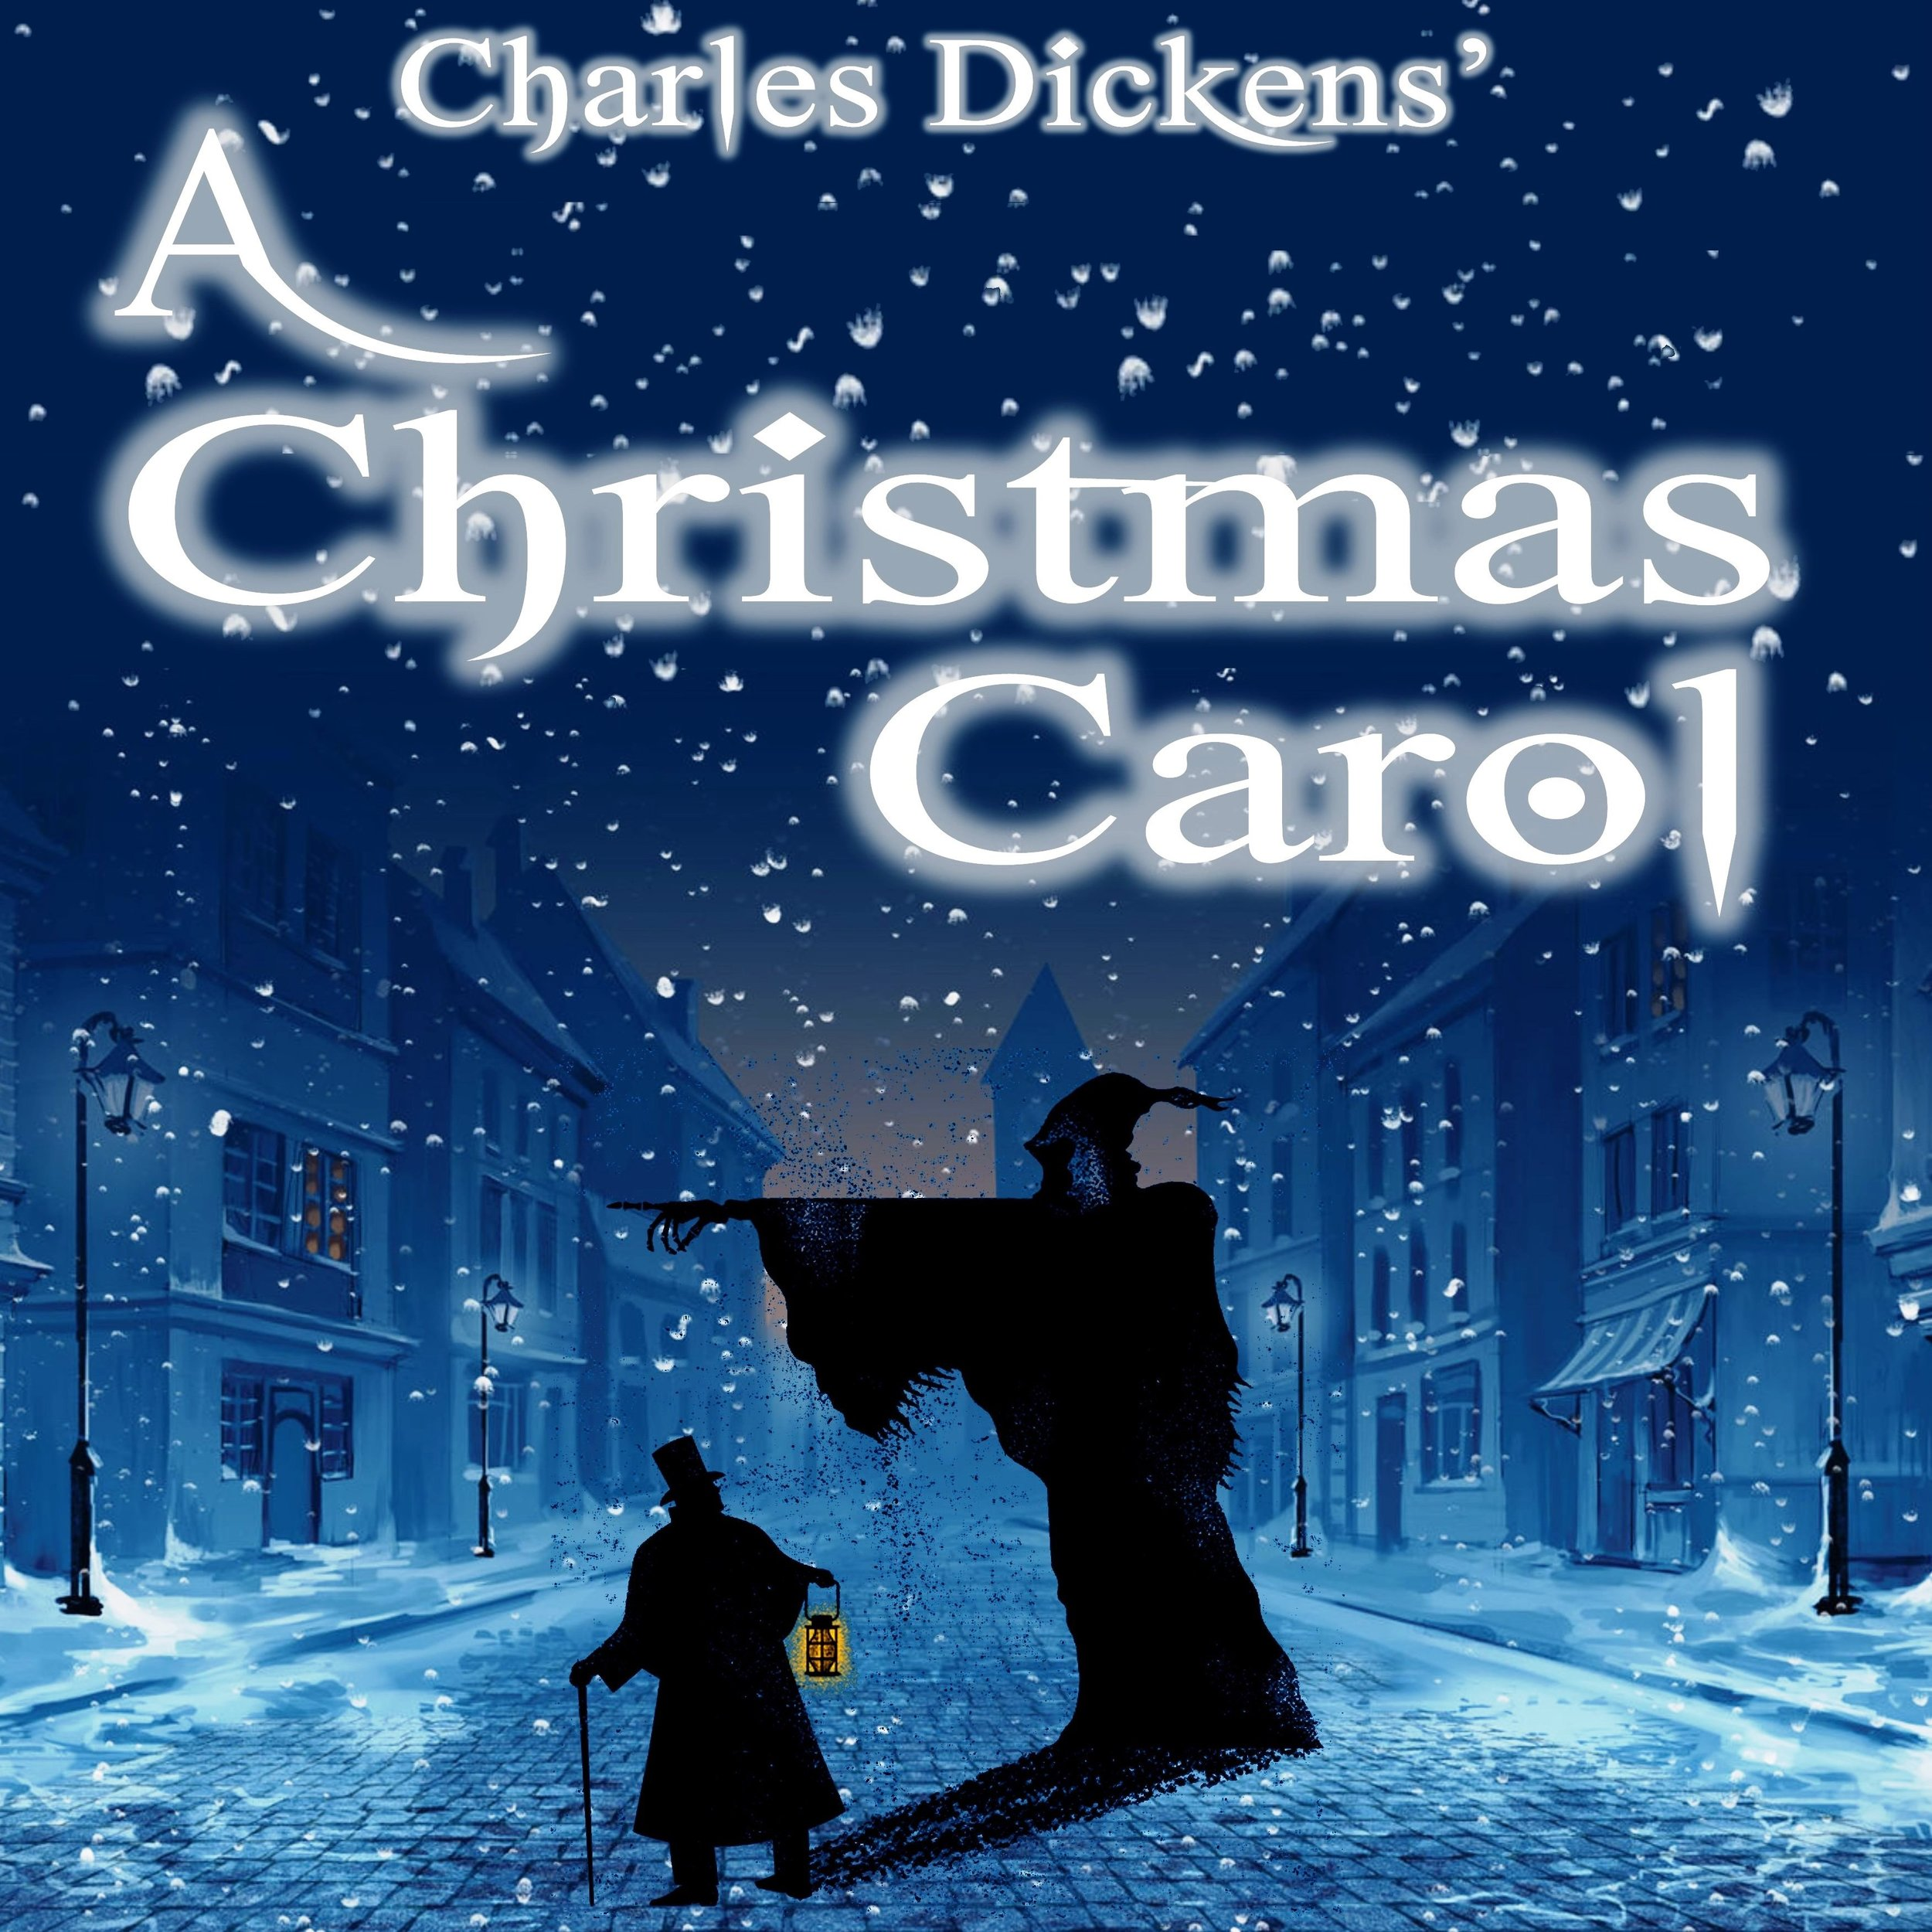 A Christmas Carol web image 2.jpg